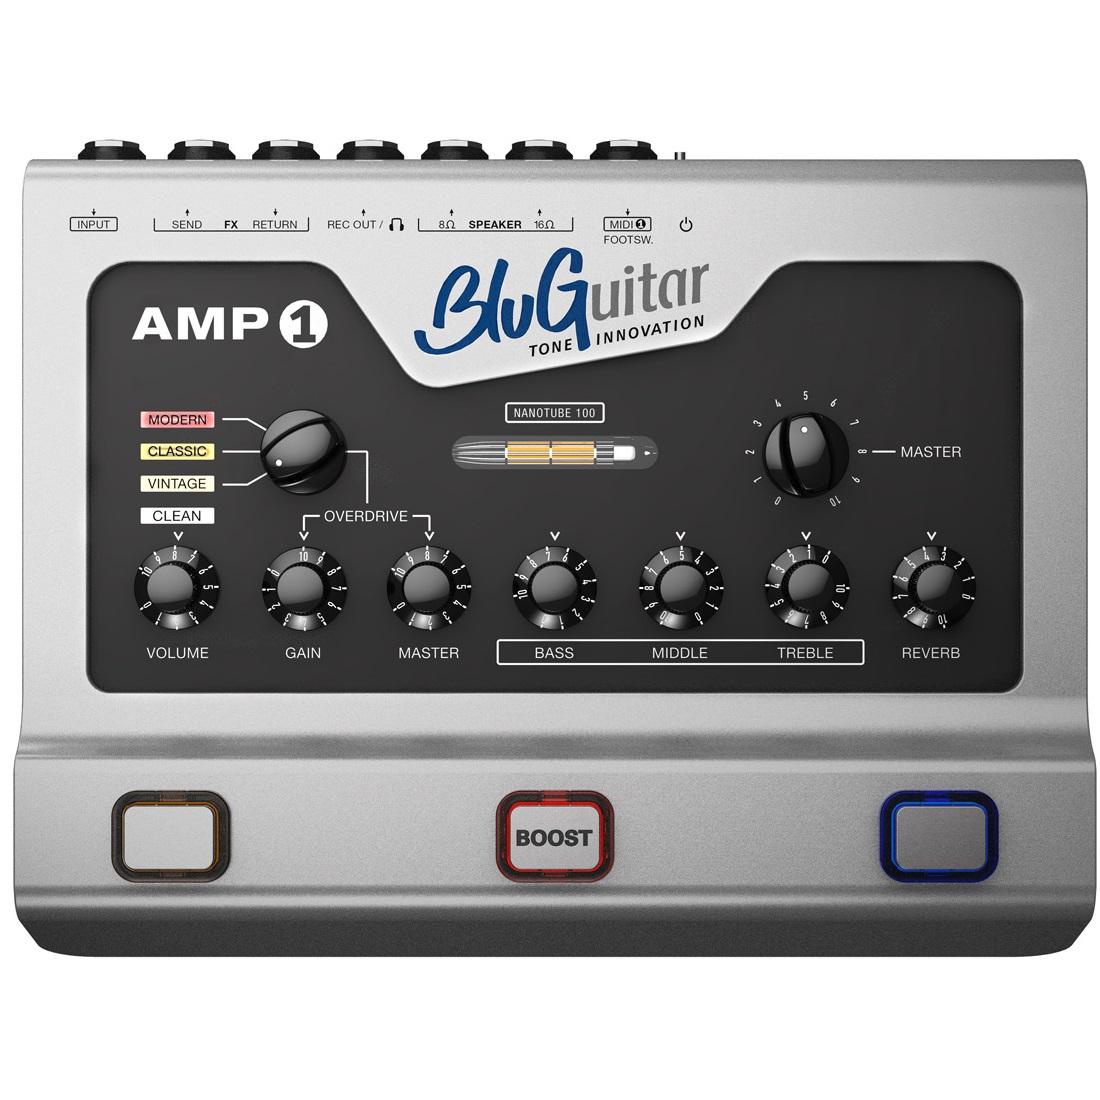 BluGuitar AMP1 1